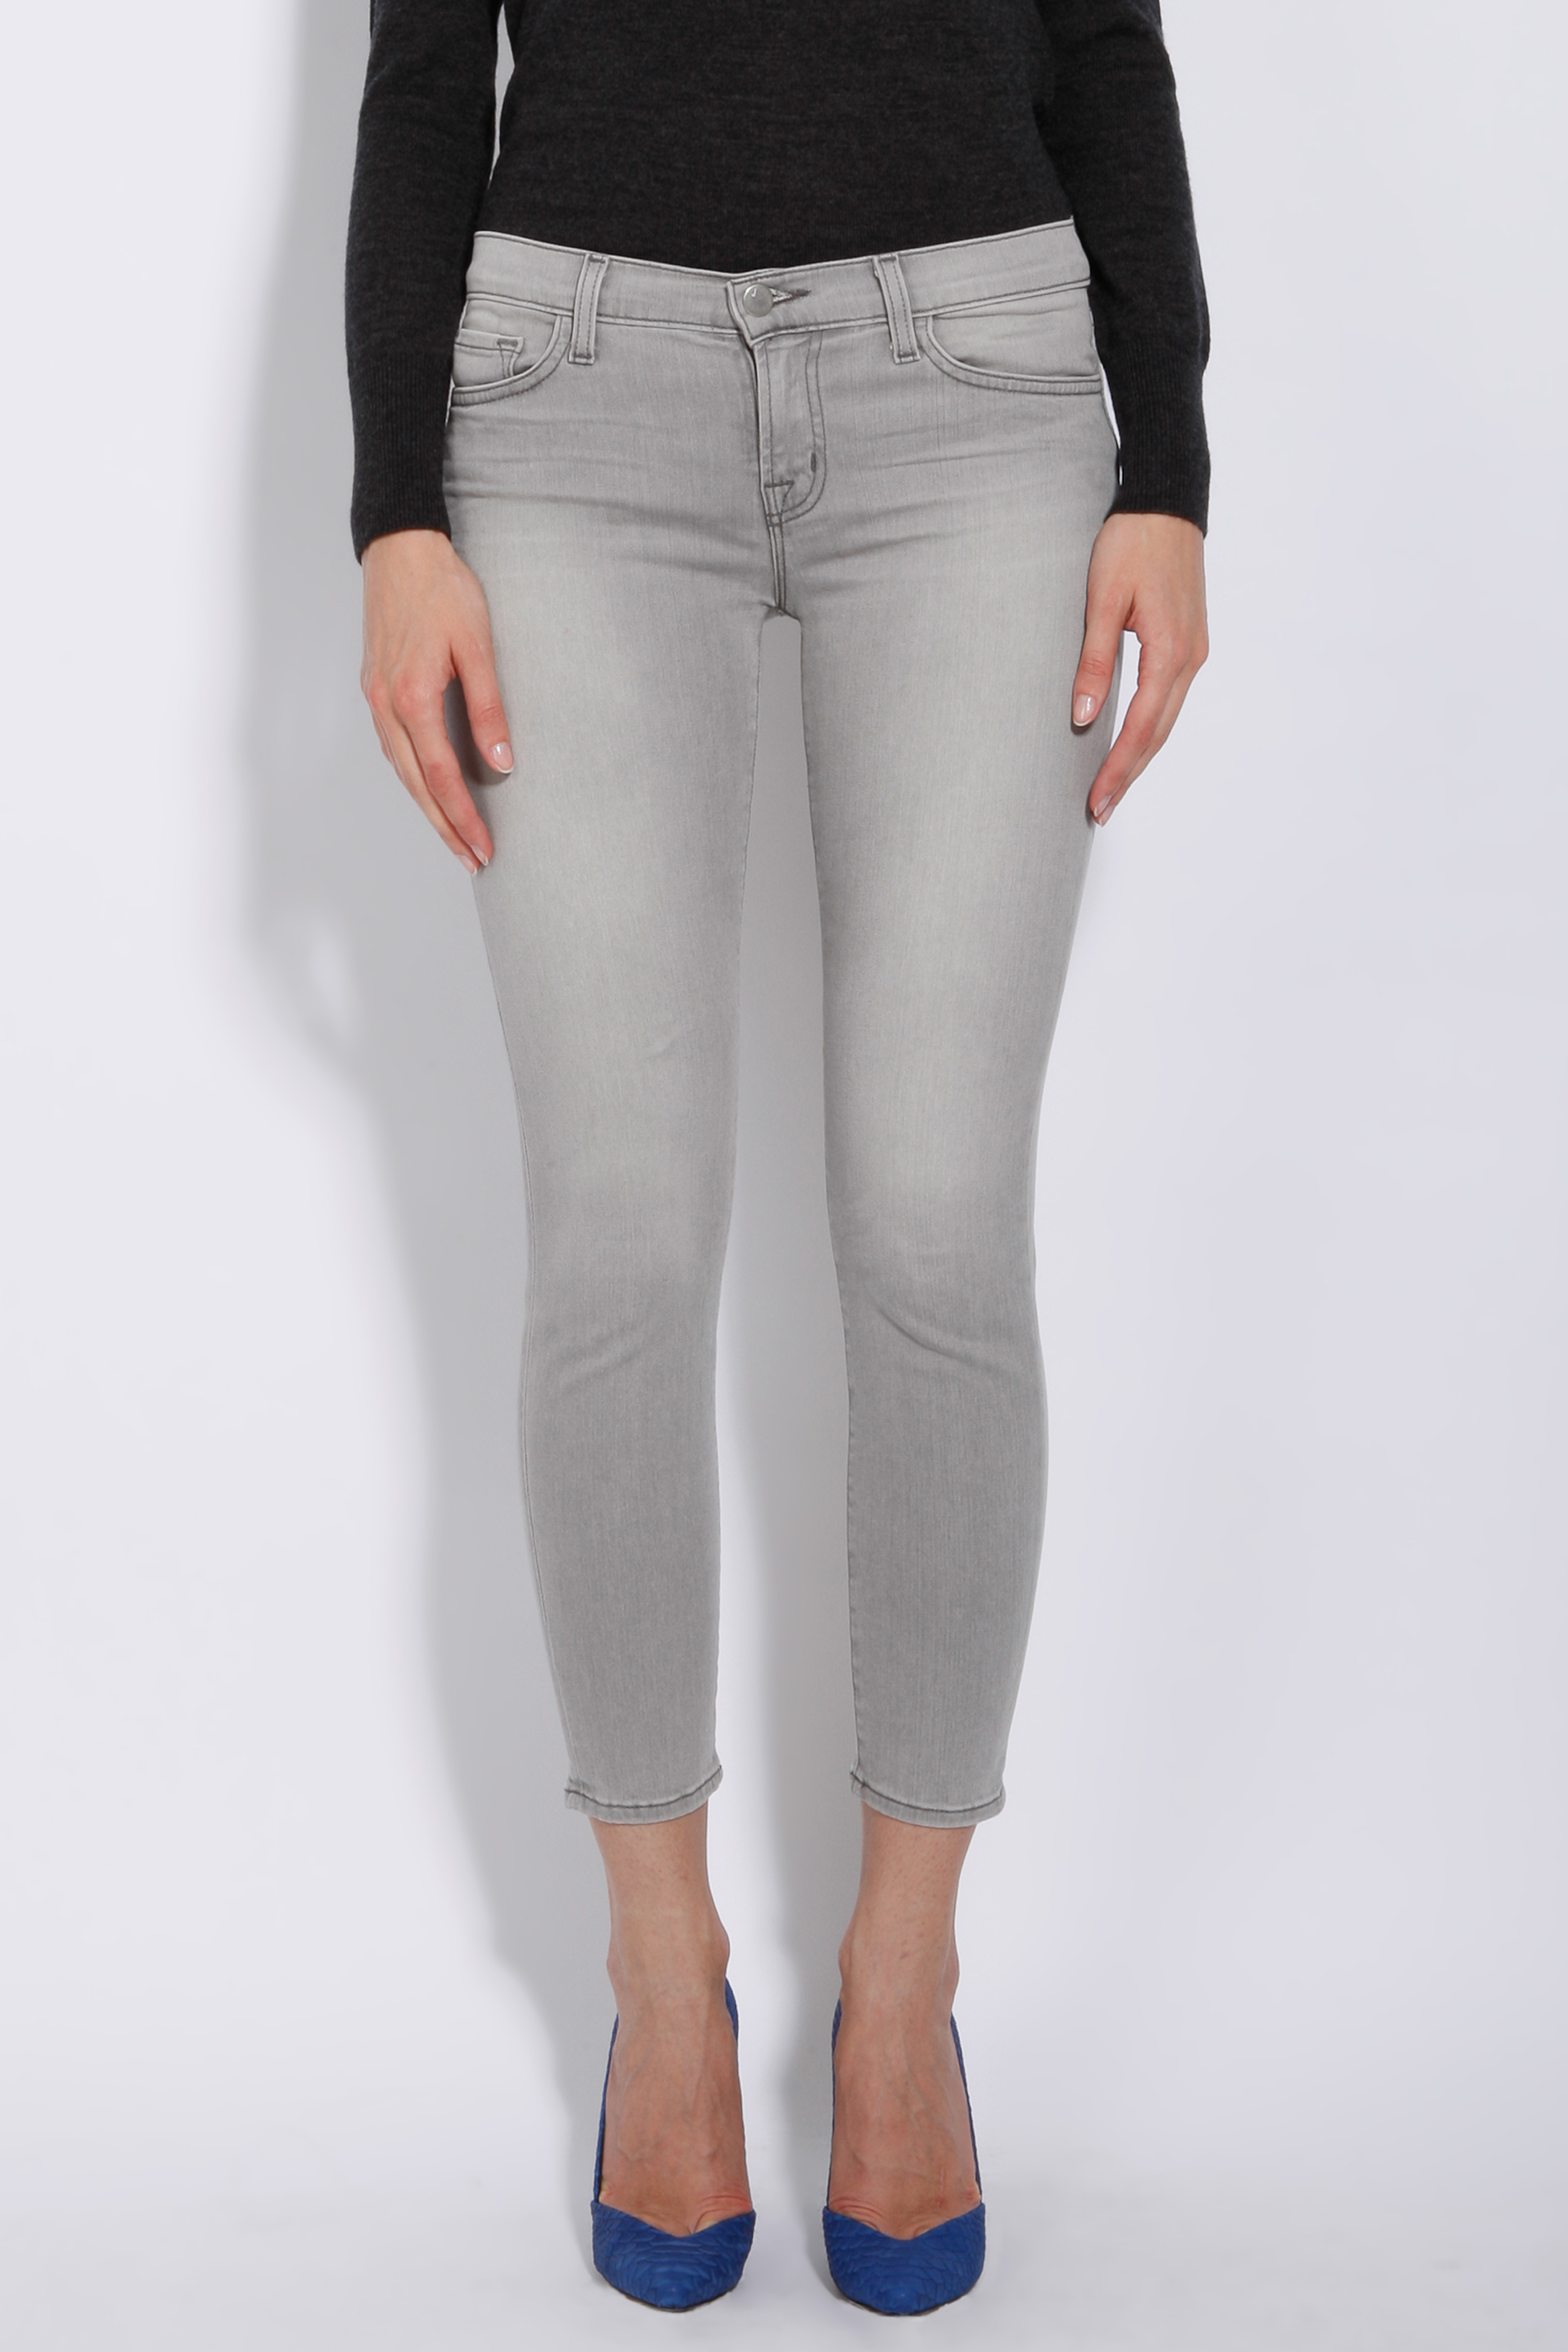 j brand capri skinny jeans in gray lyst. Black Bedroom Furniture Sets. Home Design Ideas